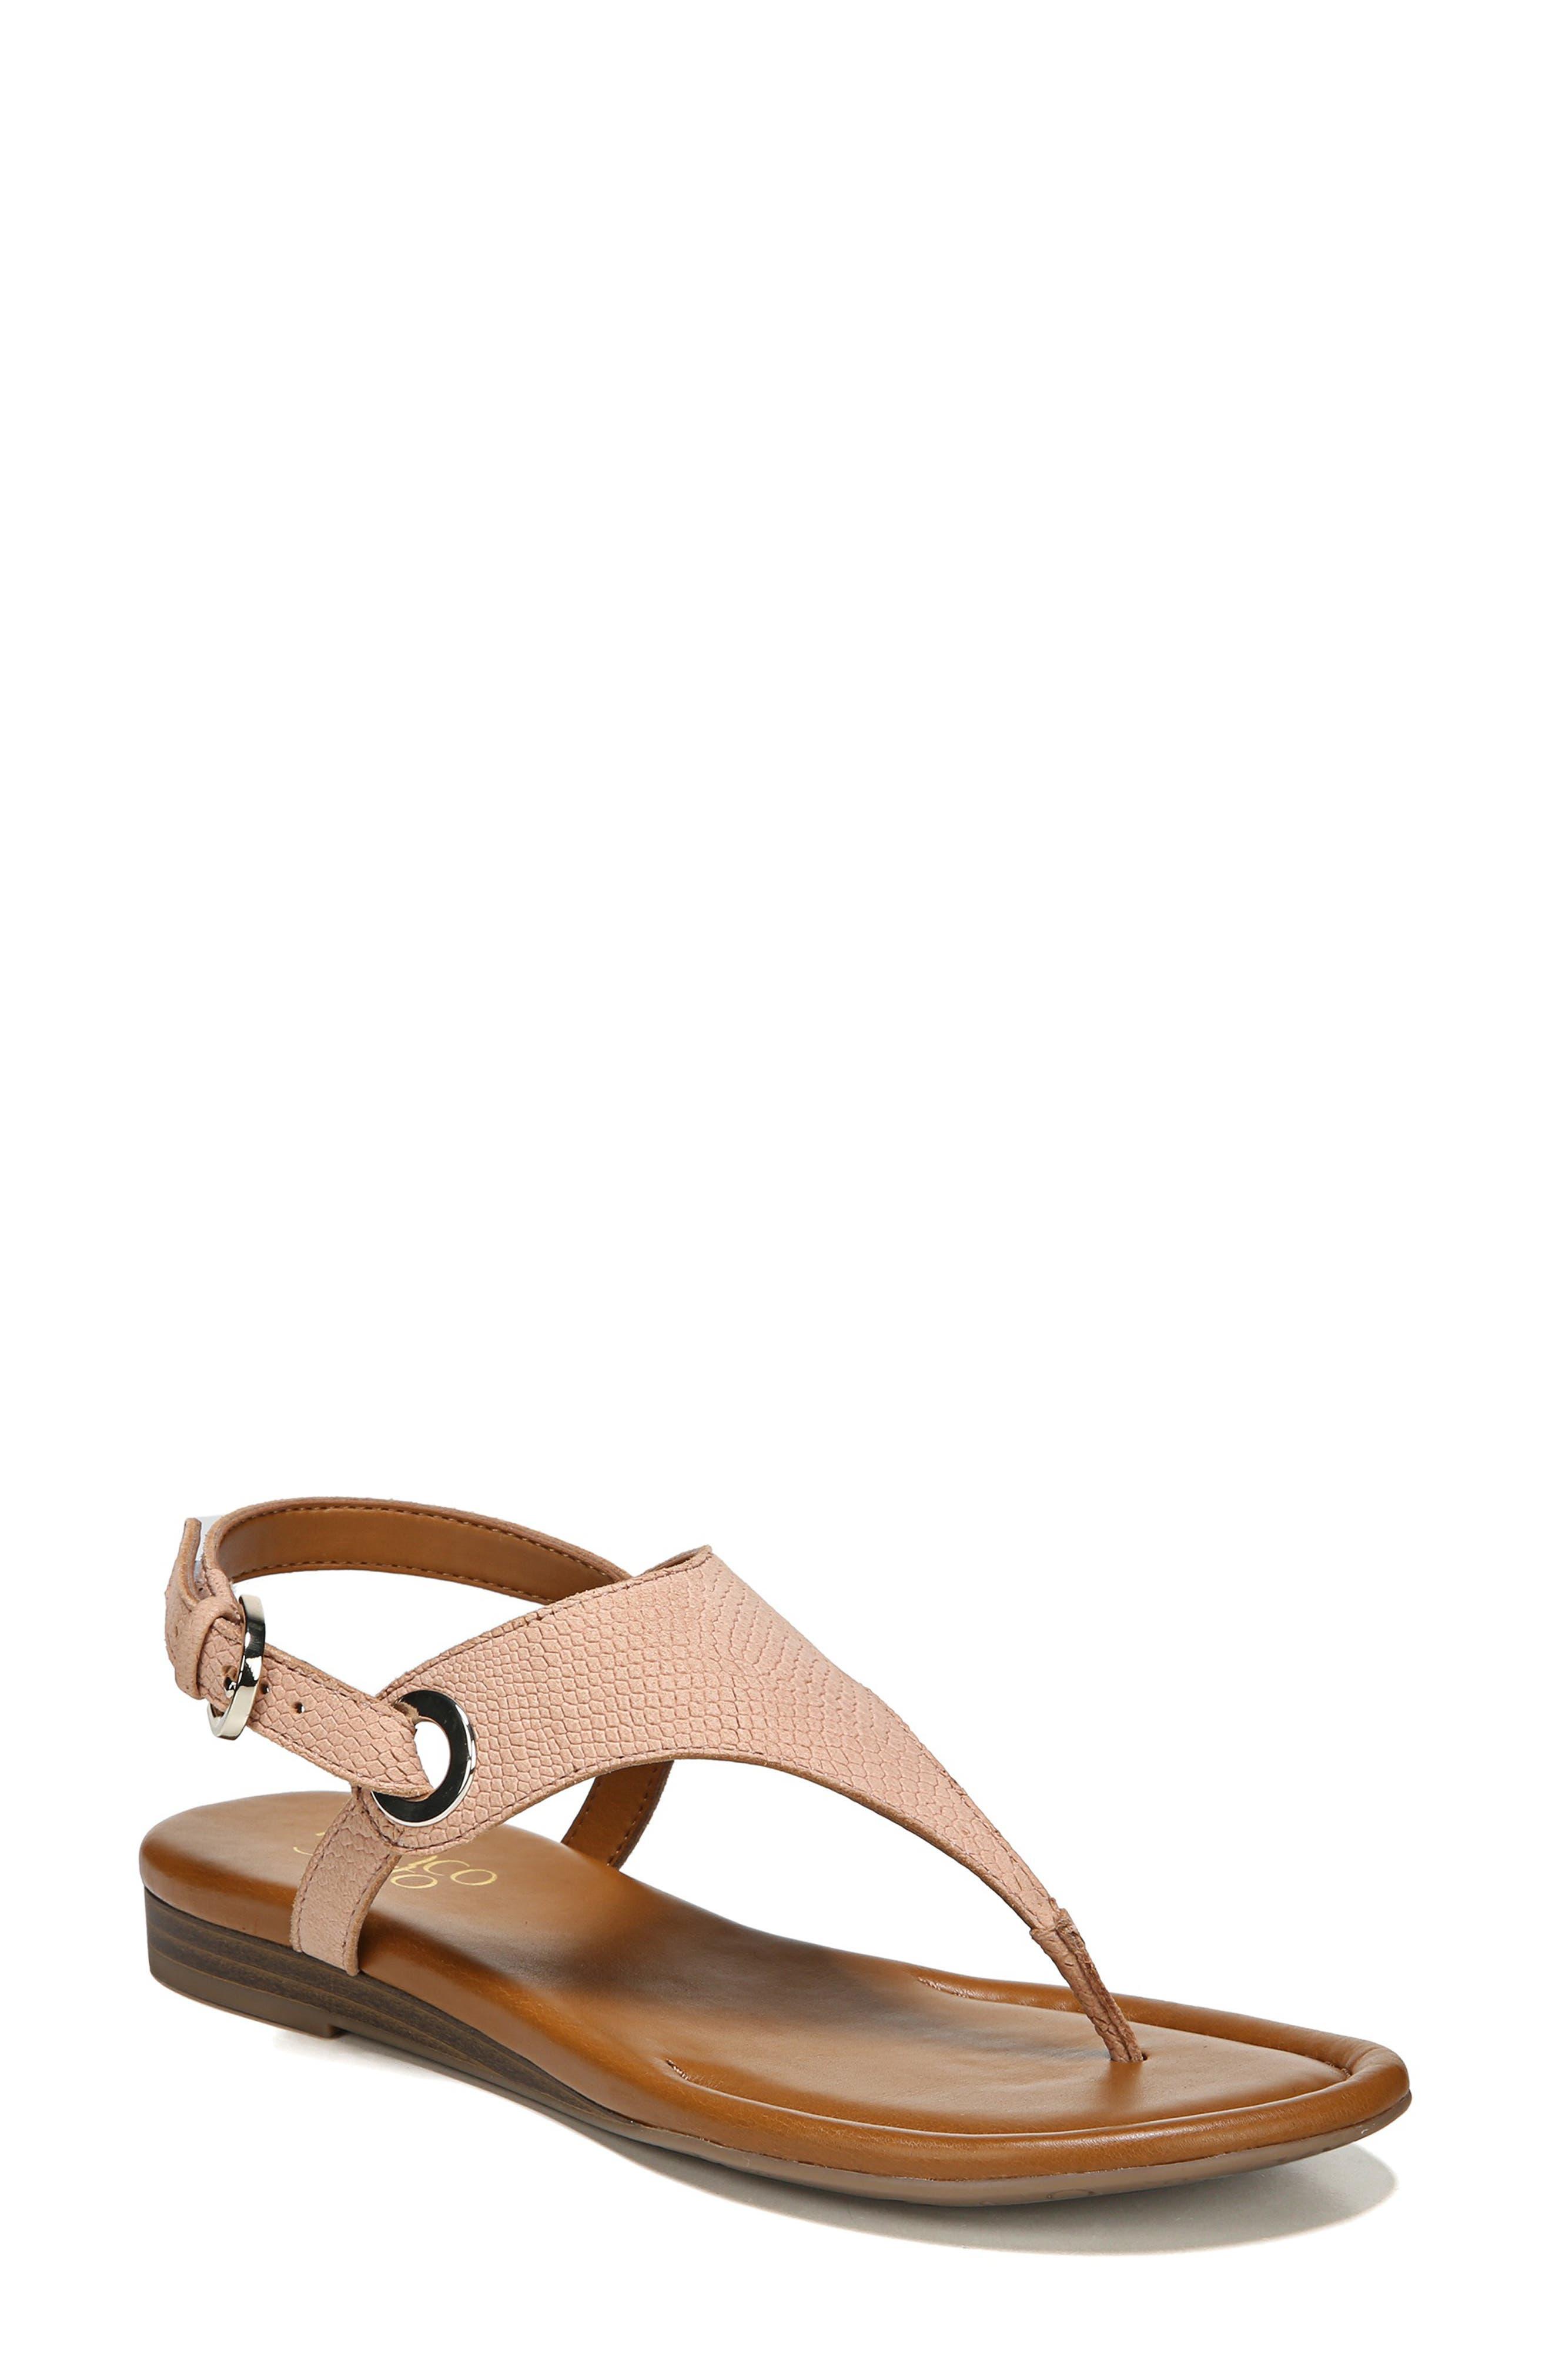 3a0591d5dcc Franco Sarto  Grip  Sandal- Pink